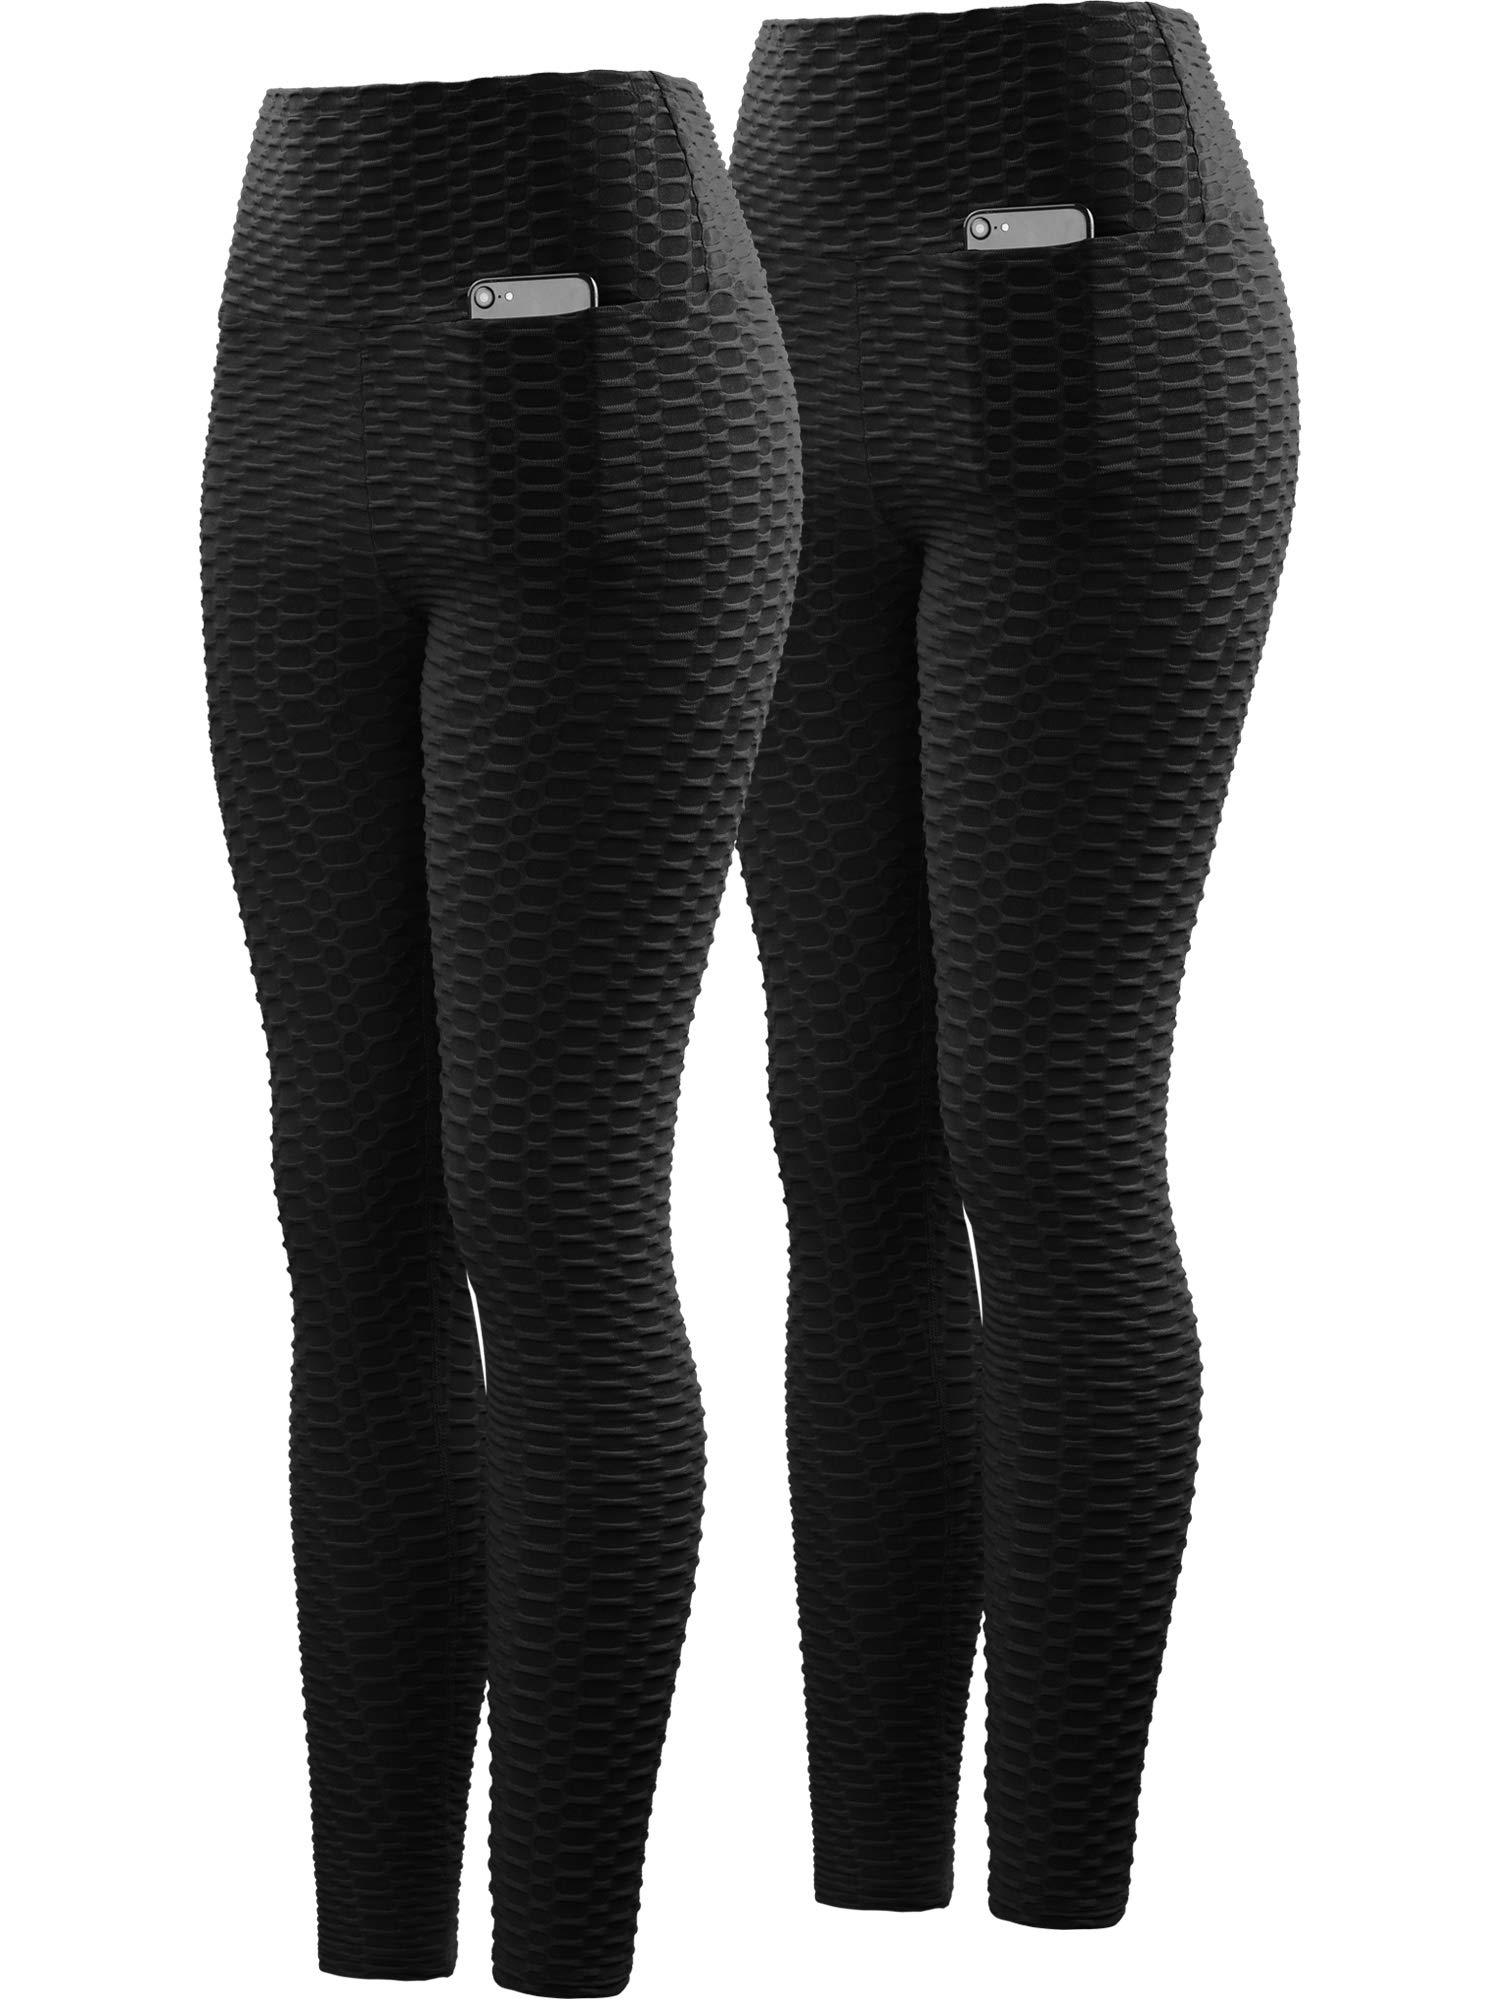 Neleus Women's 2 Pack Tummy Control High Waist Leggings Out Pocket,9036,Black/Black,S,EU M by Neleus (Image #1)